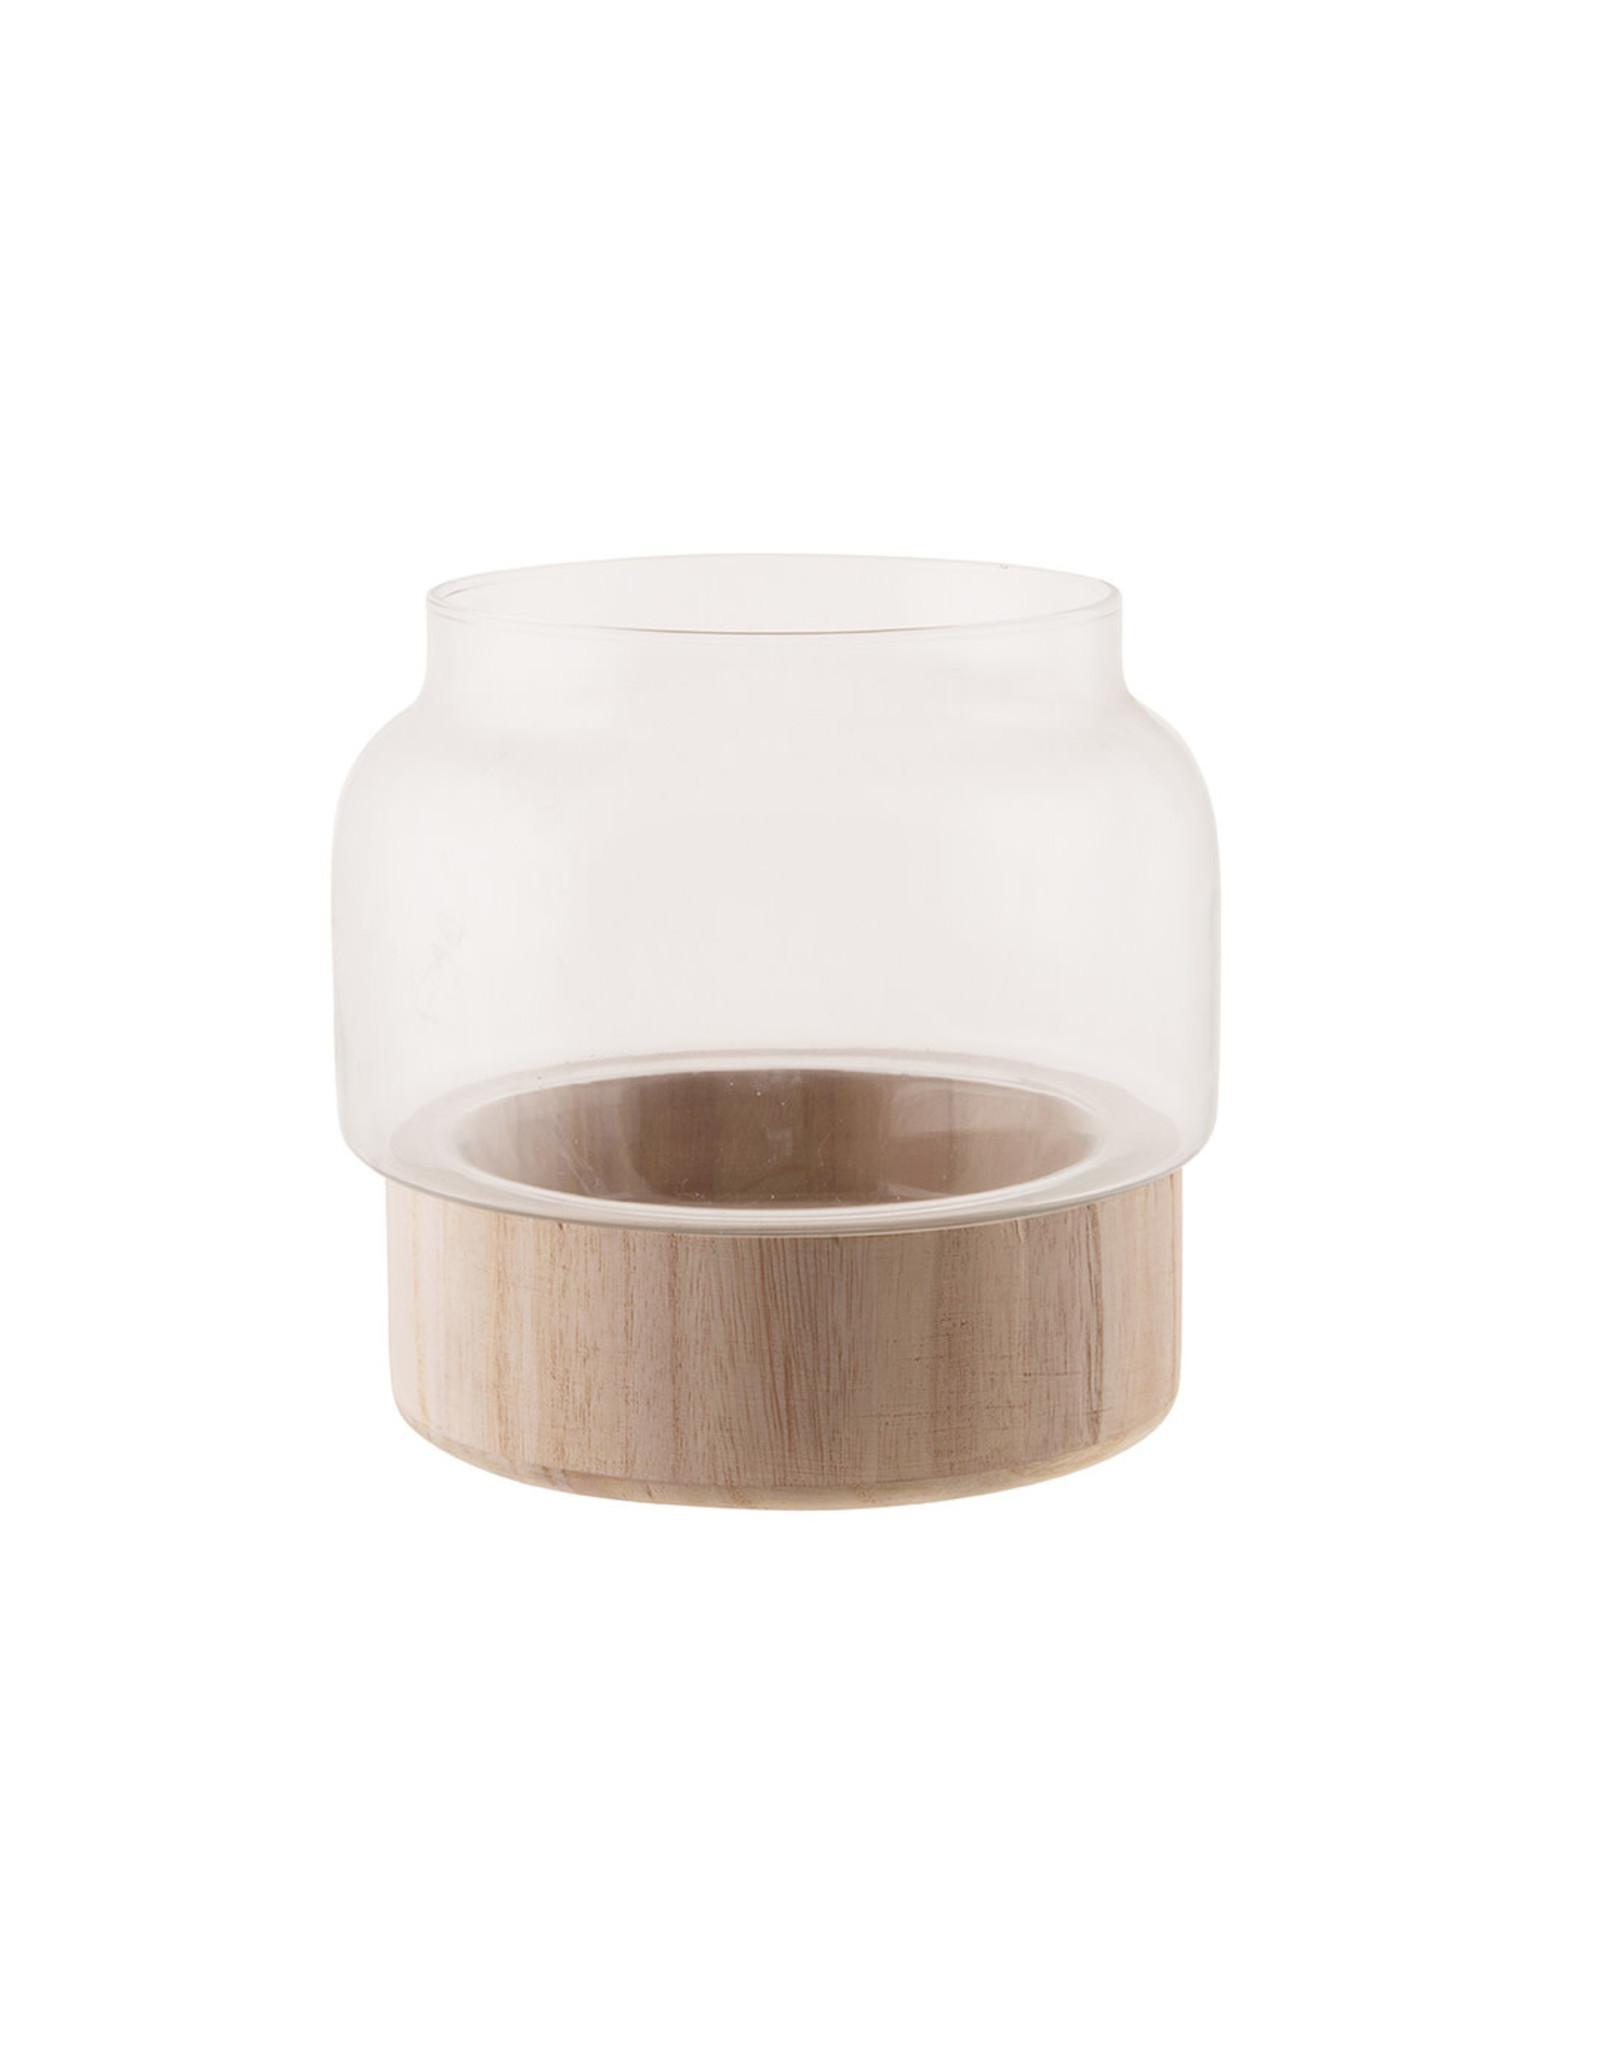 Dijk Glass vase with wooden base 17.6x17.6x17cm